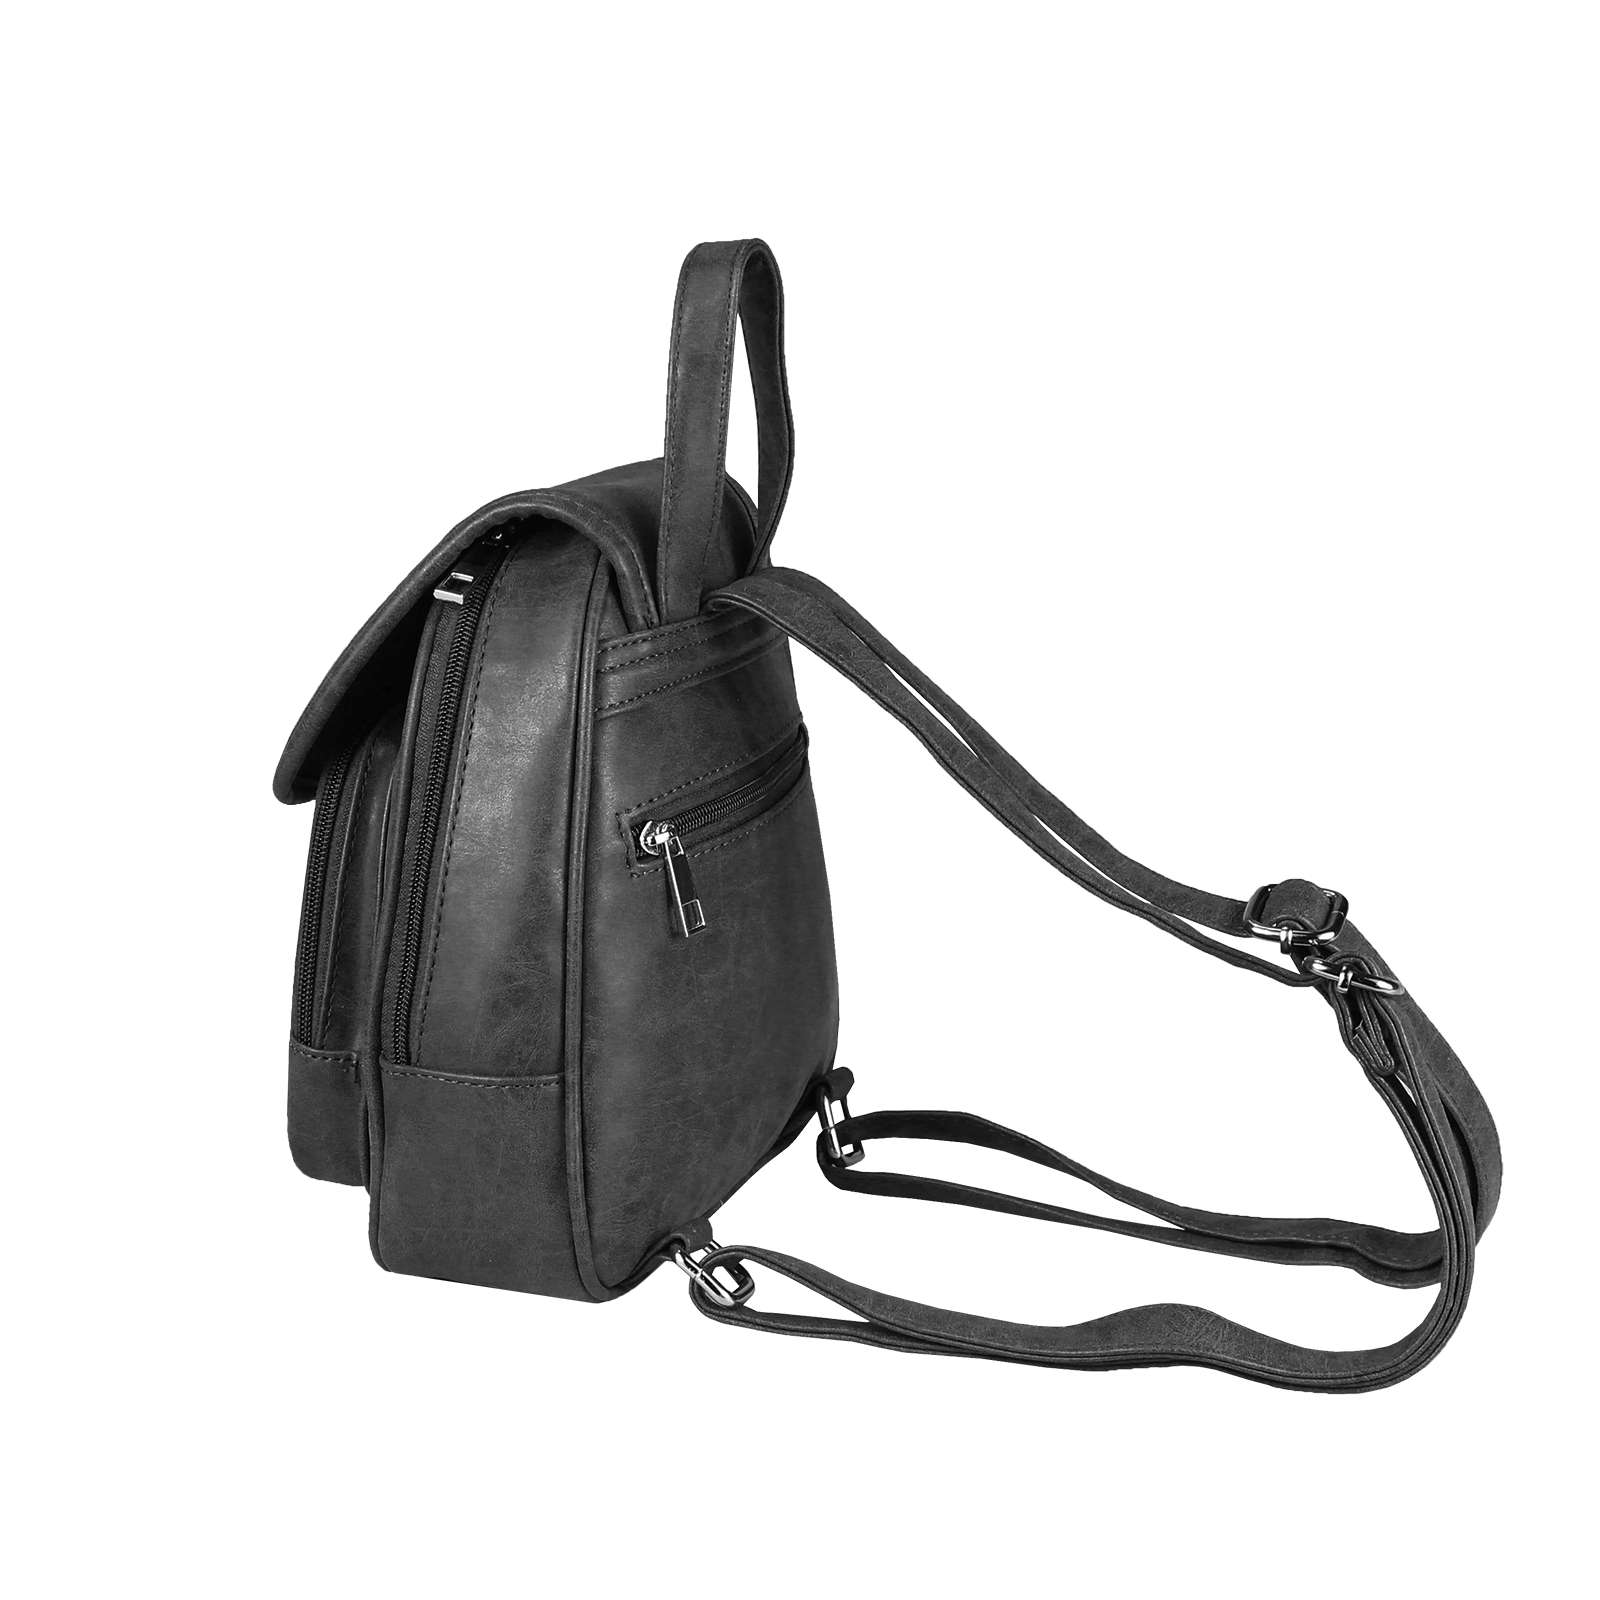 b95fac829313f DAMEN ECHT LEDER Rucksack Daypack BAG Hand-Tasche Schultertasche ...